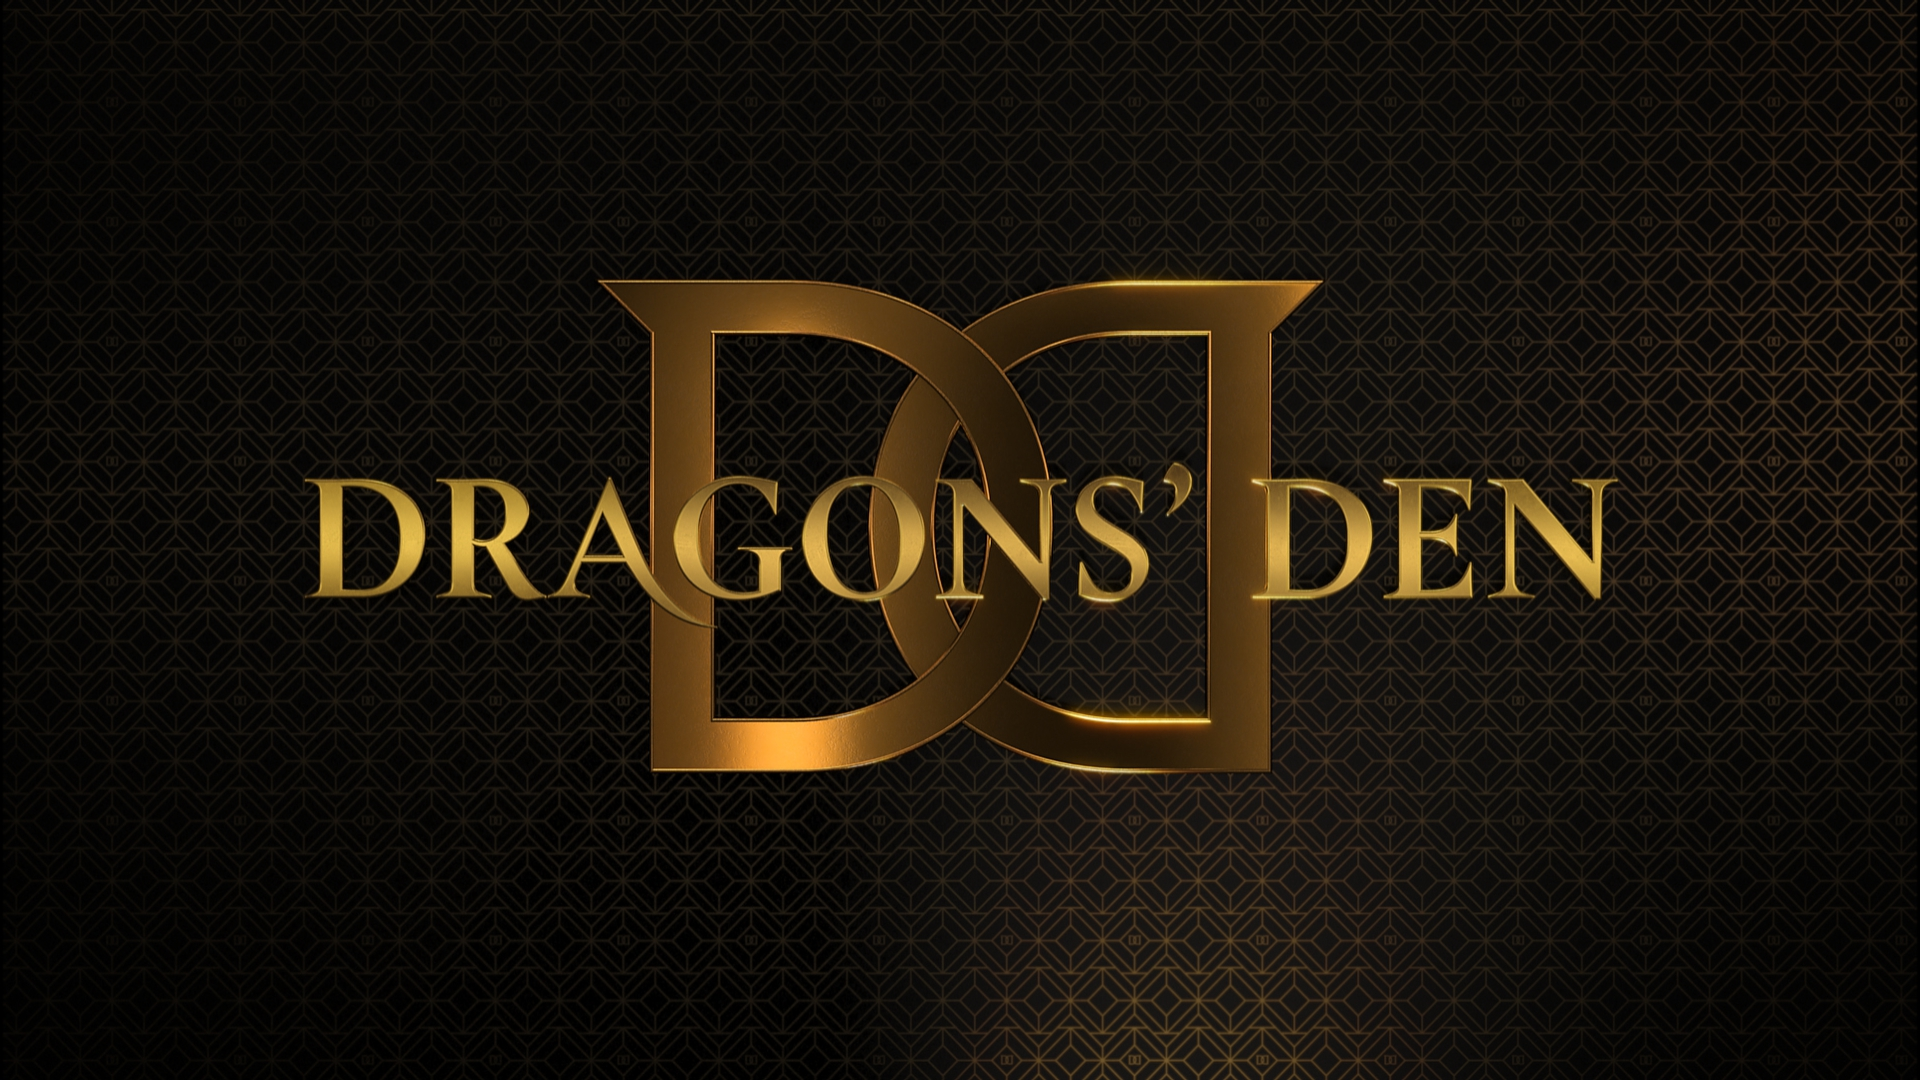 dragons-den-grab_1.26.4